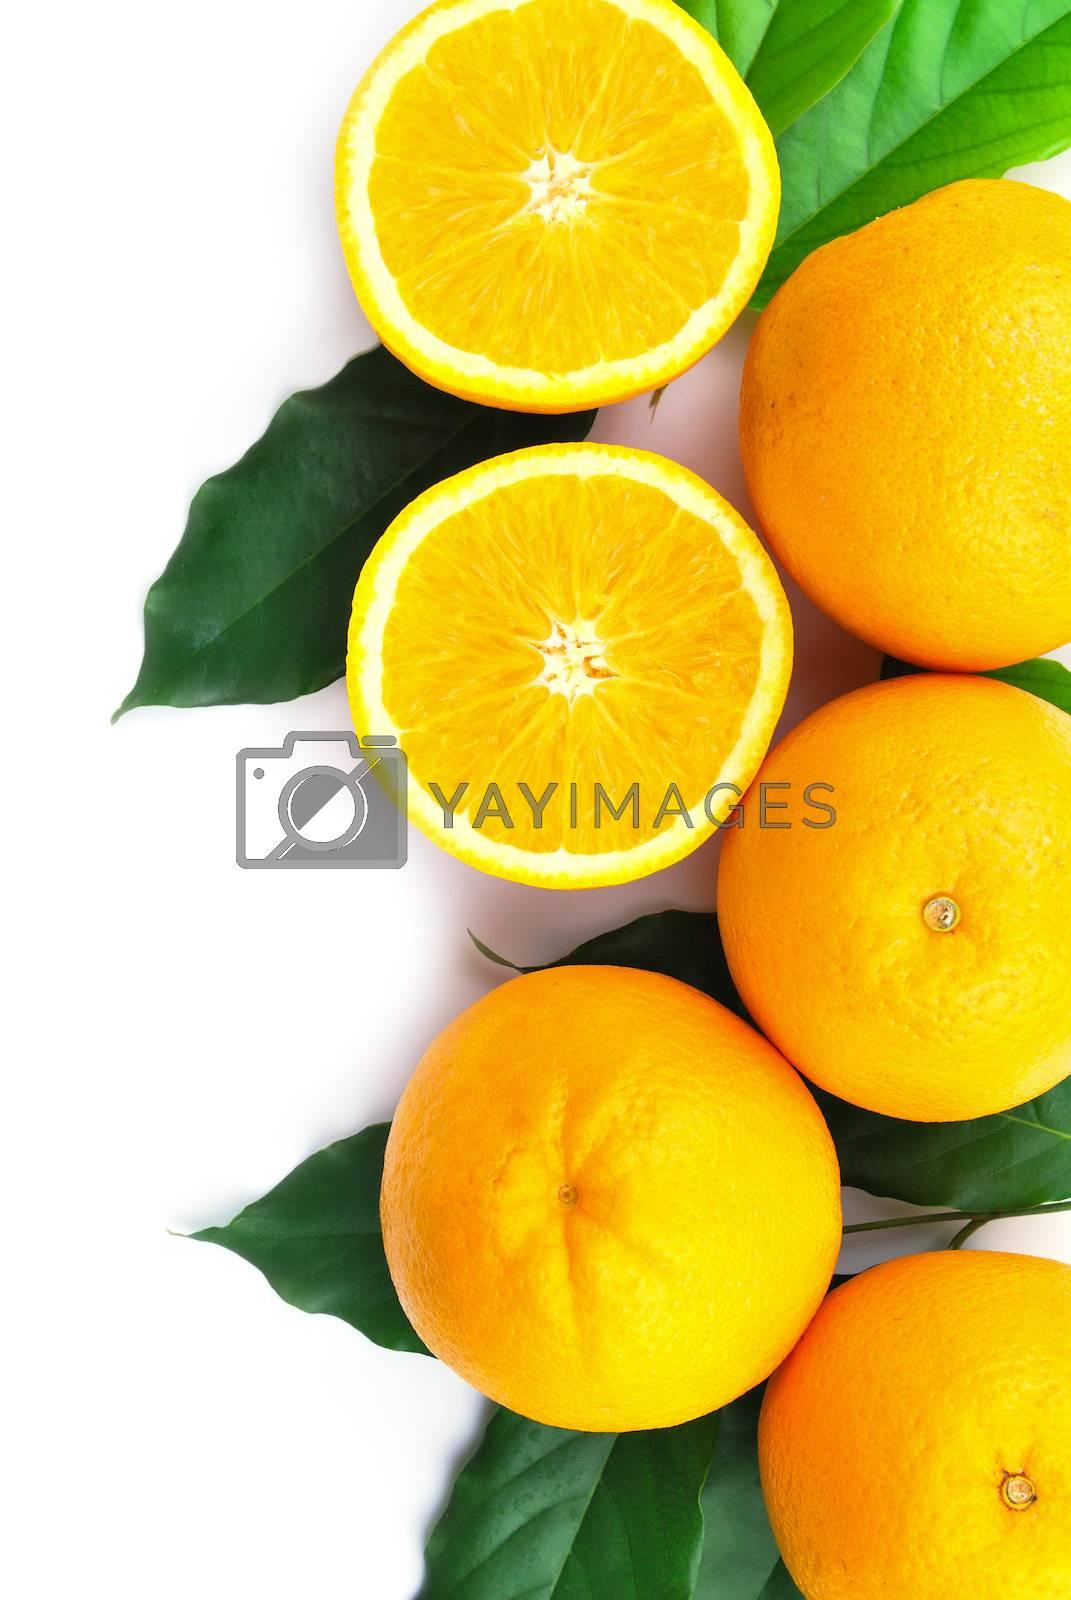 Royalty free image of Orange fruit by teen00000